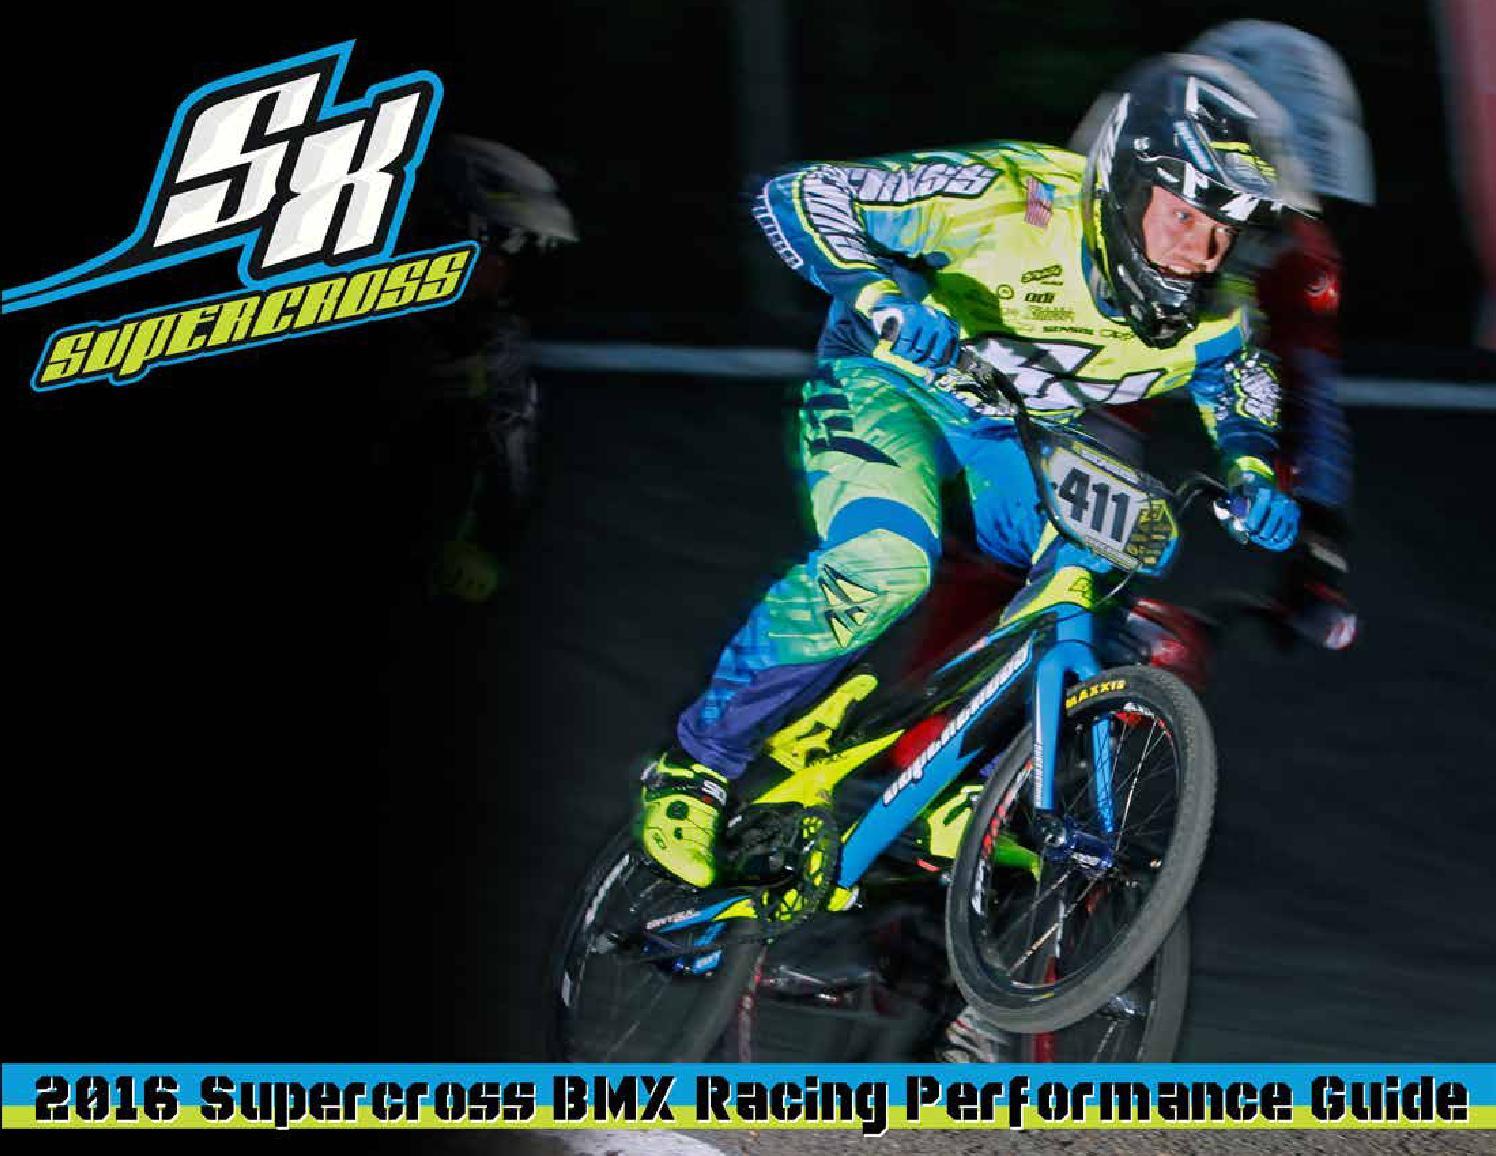 2016 supercross bmx catalog by Supercross BMX - issuu